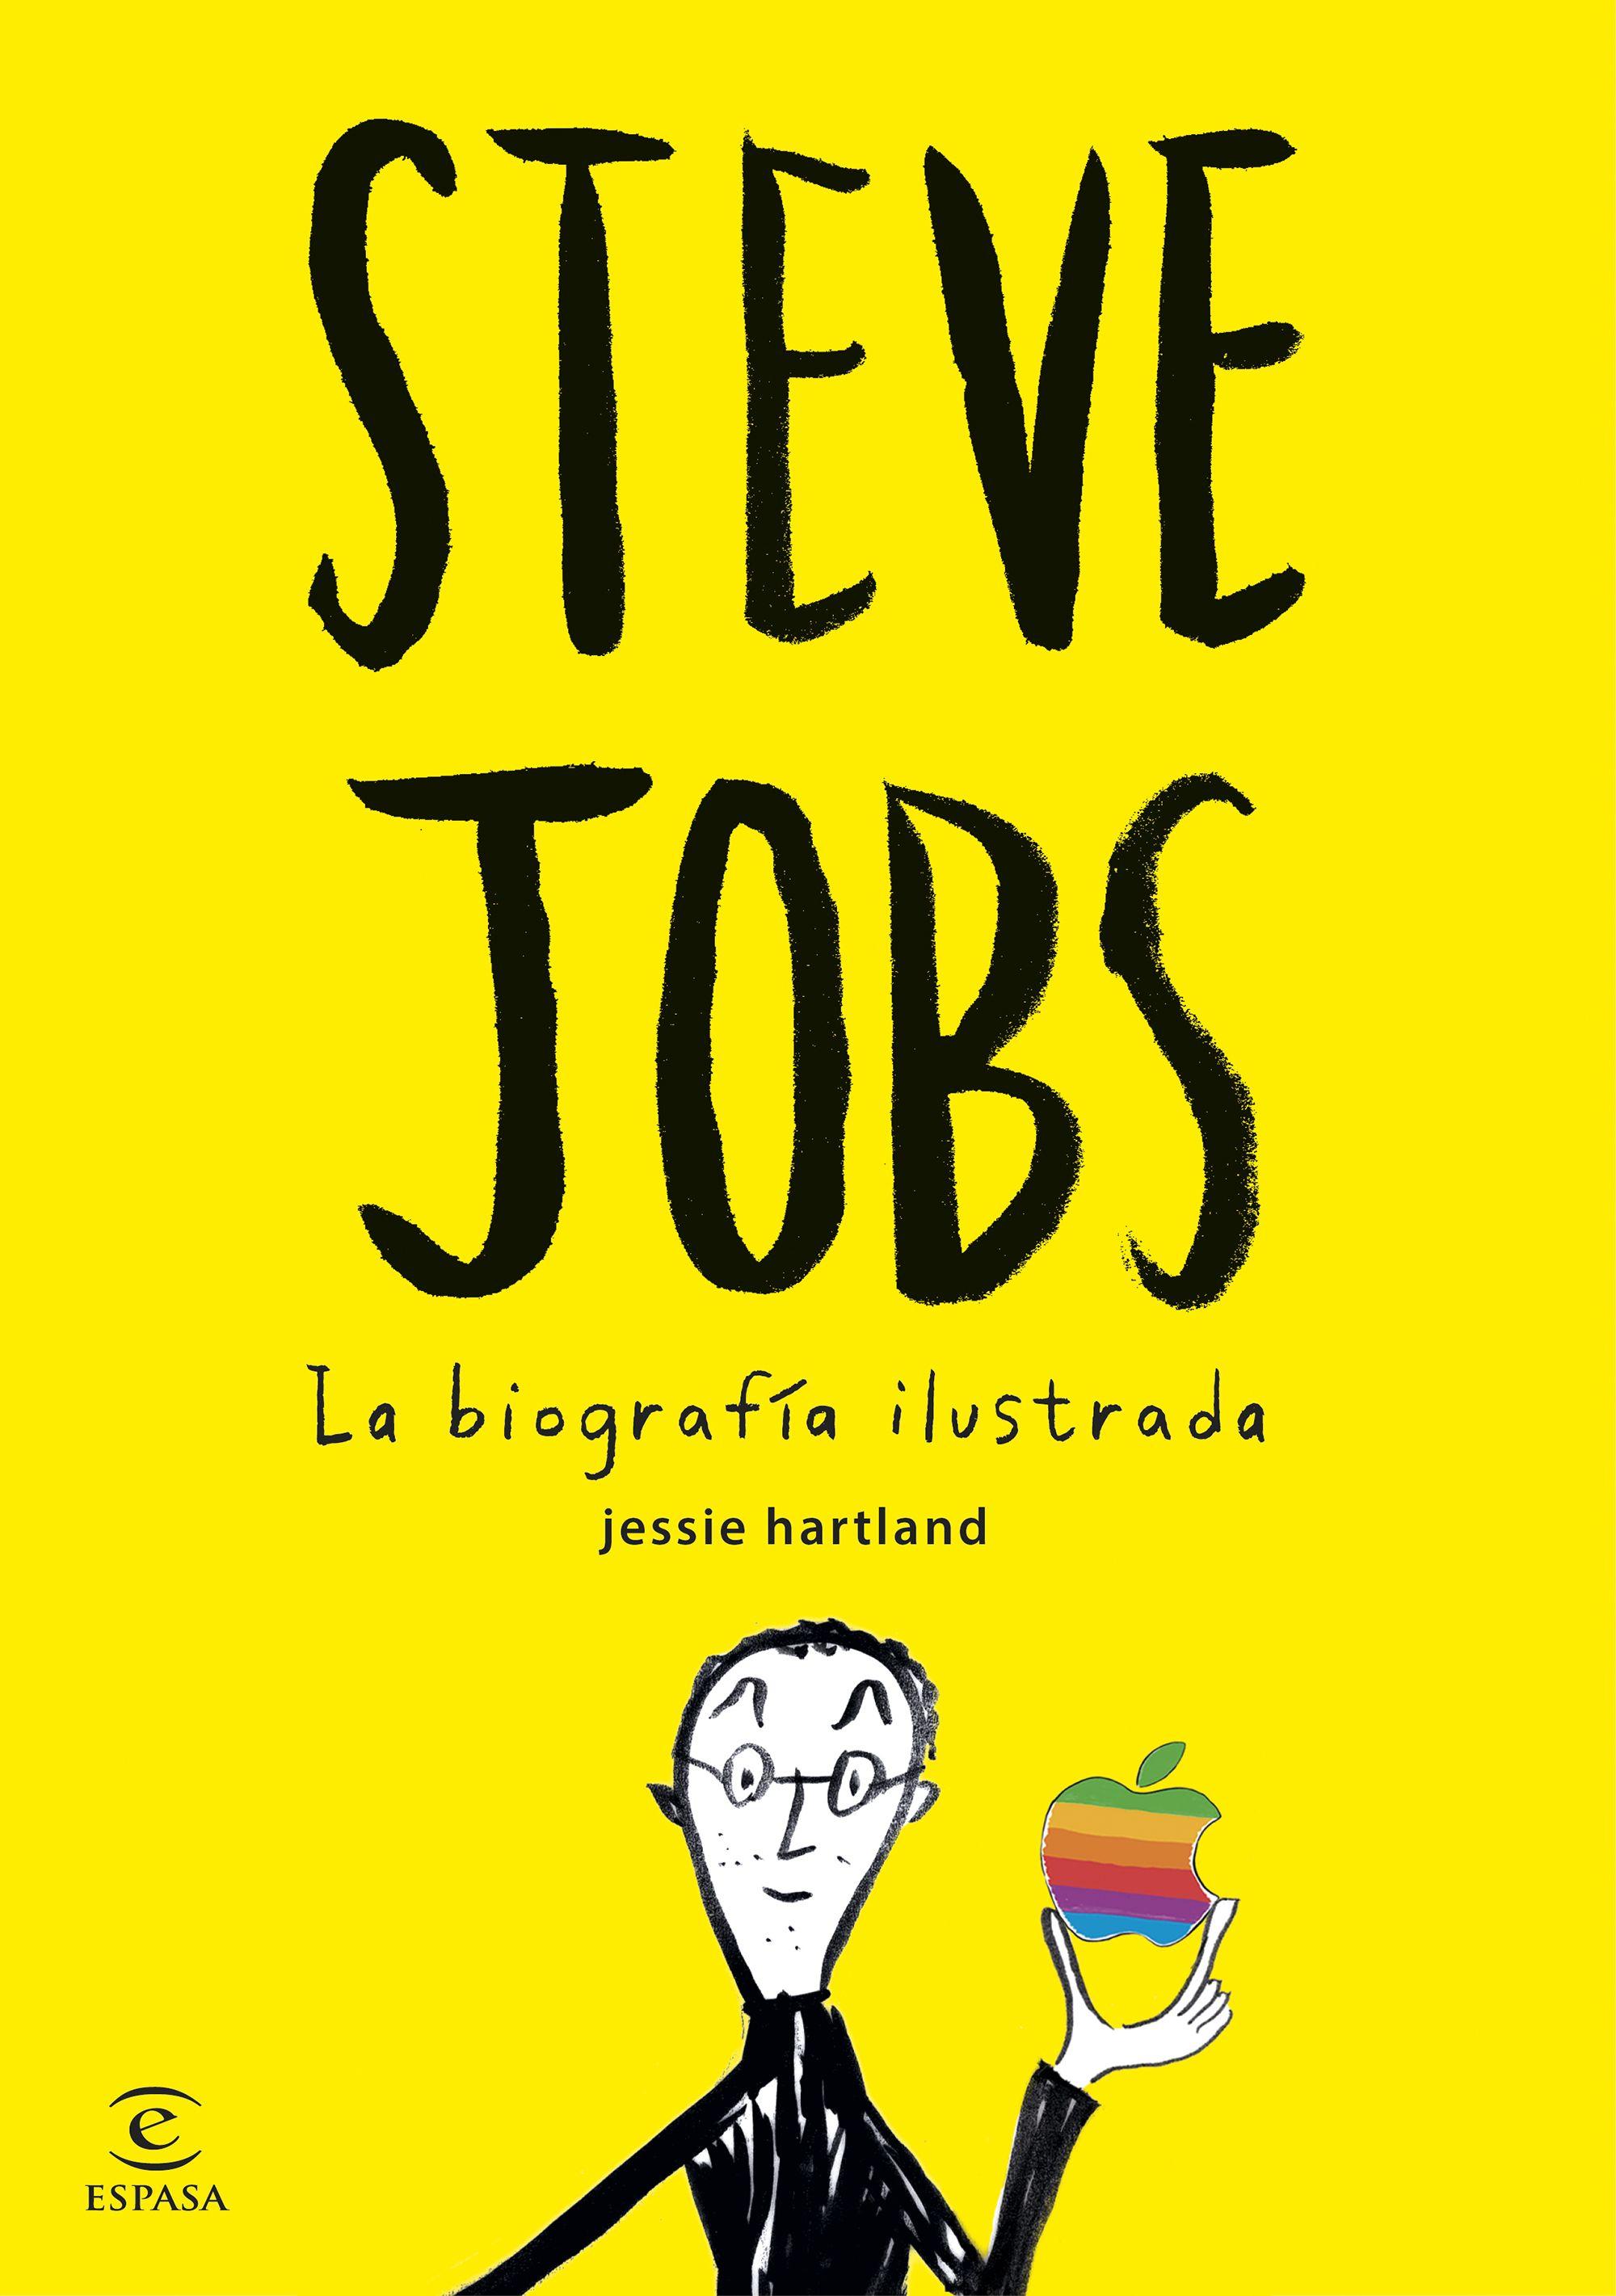 Steve Jobs La Biografia Ilustrada Jessie Hartland Comprar